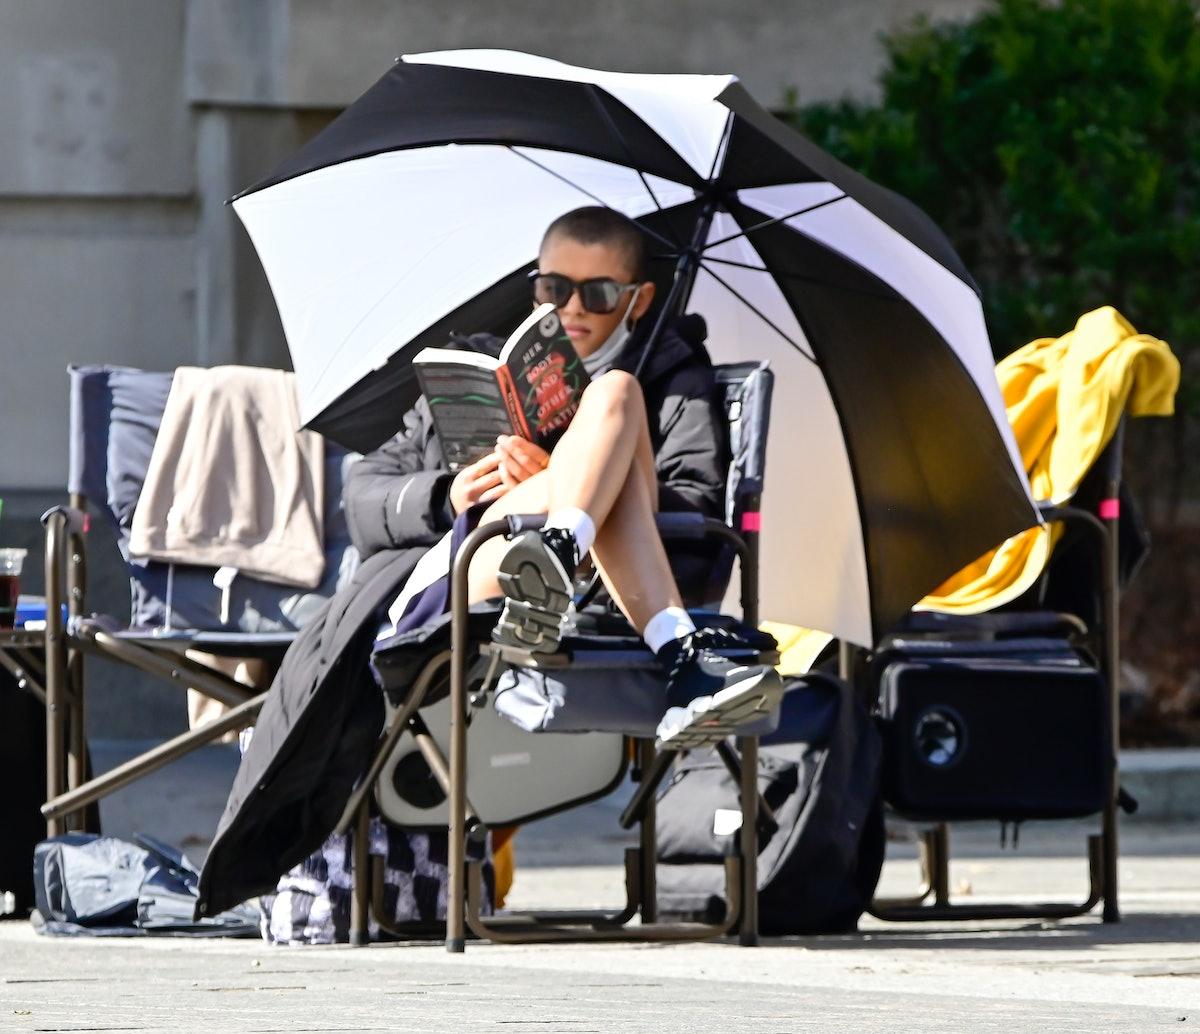 Jordan Alexander just chillin under an umbrella on the Gossip Girl reboot set